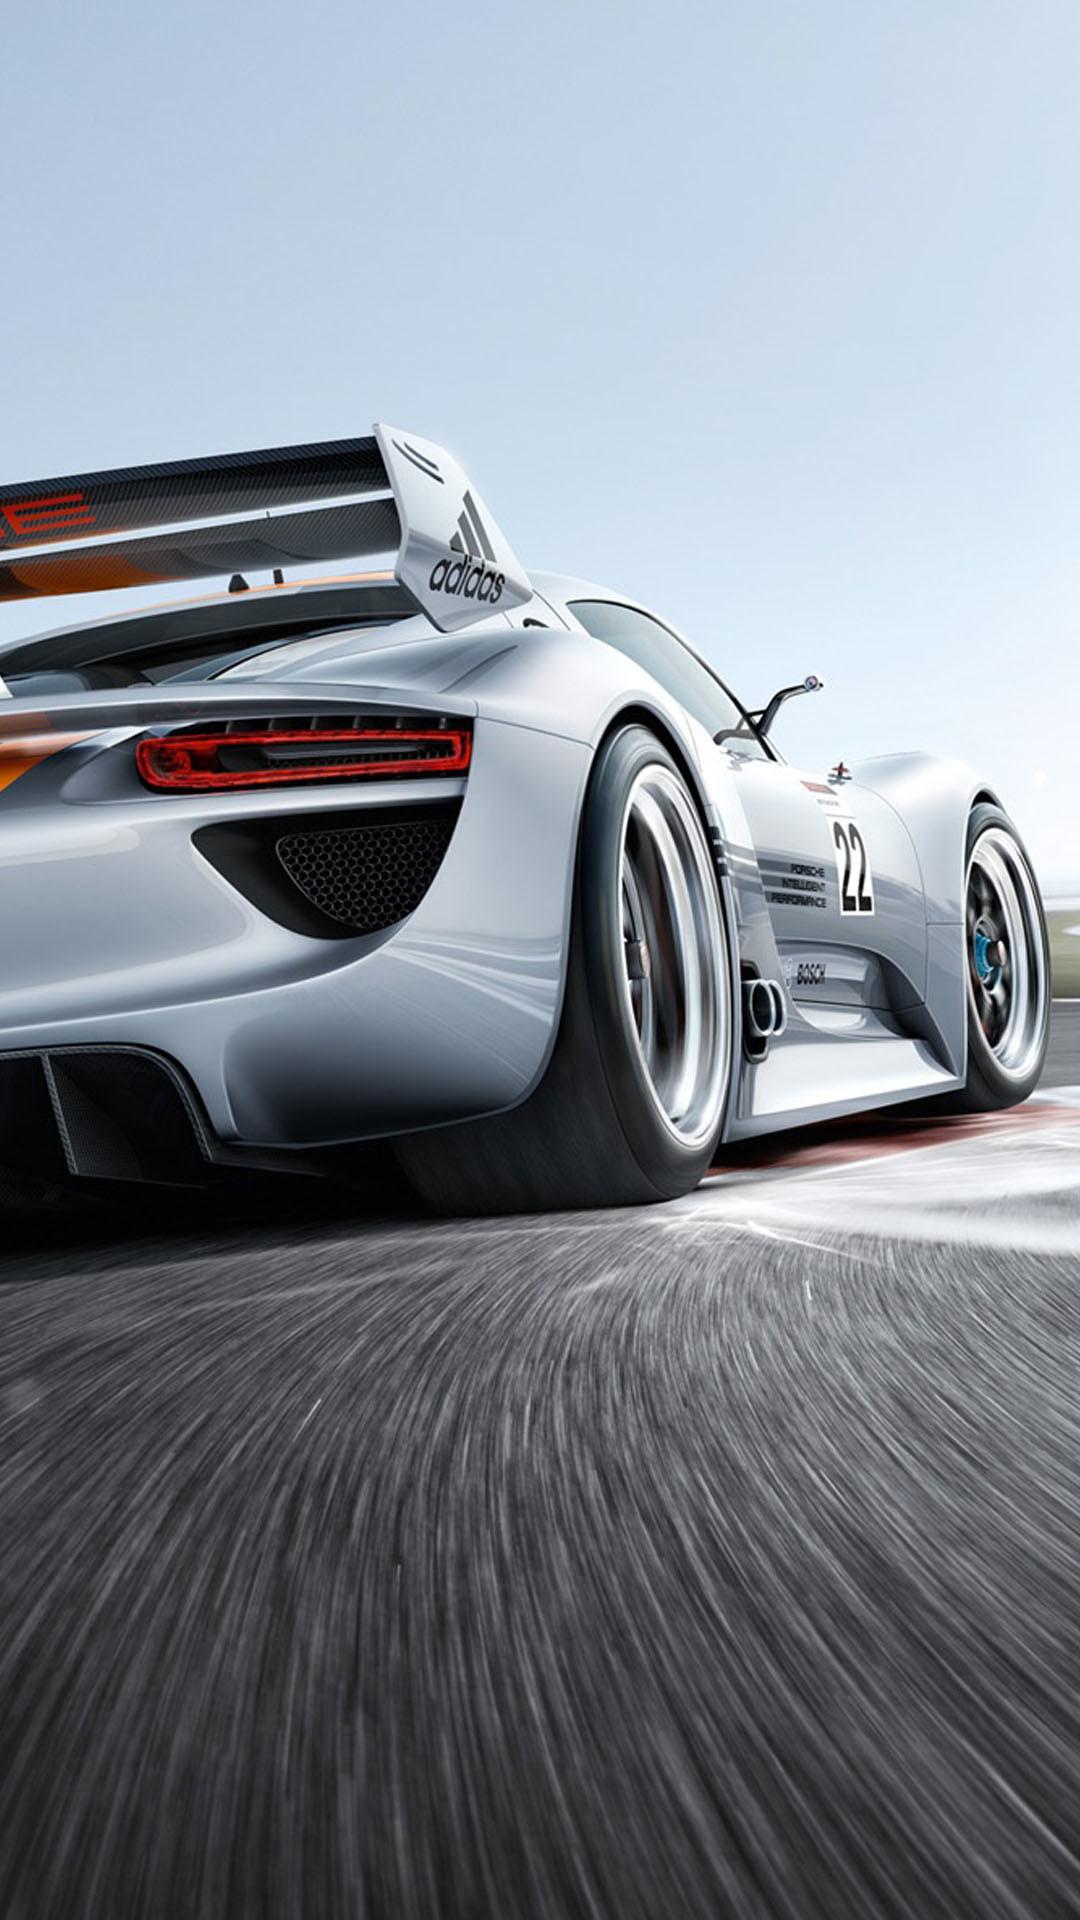 Porsche Wallpaper 73 Images